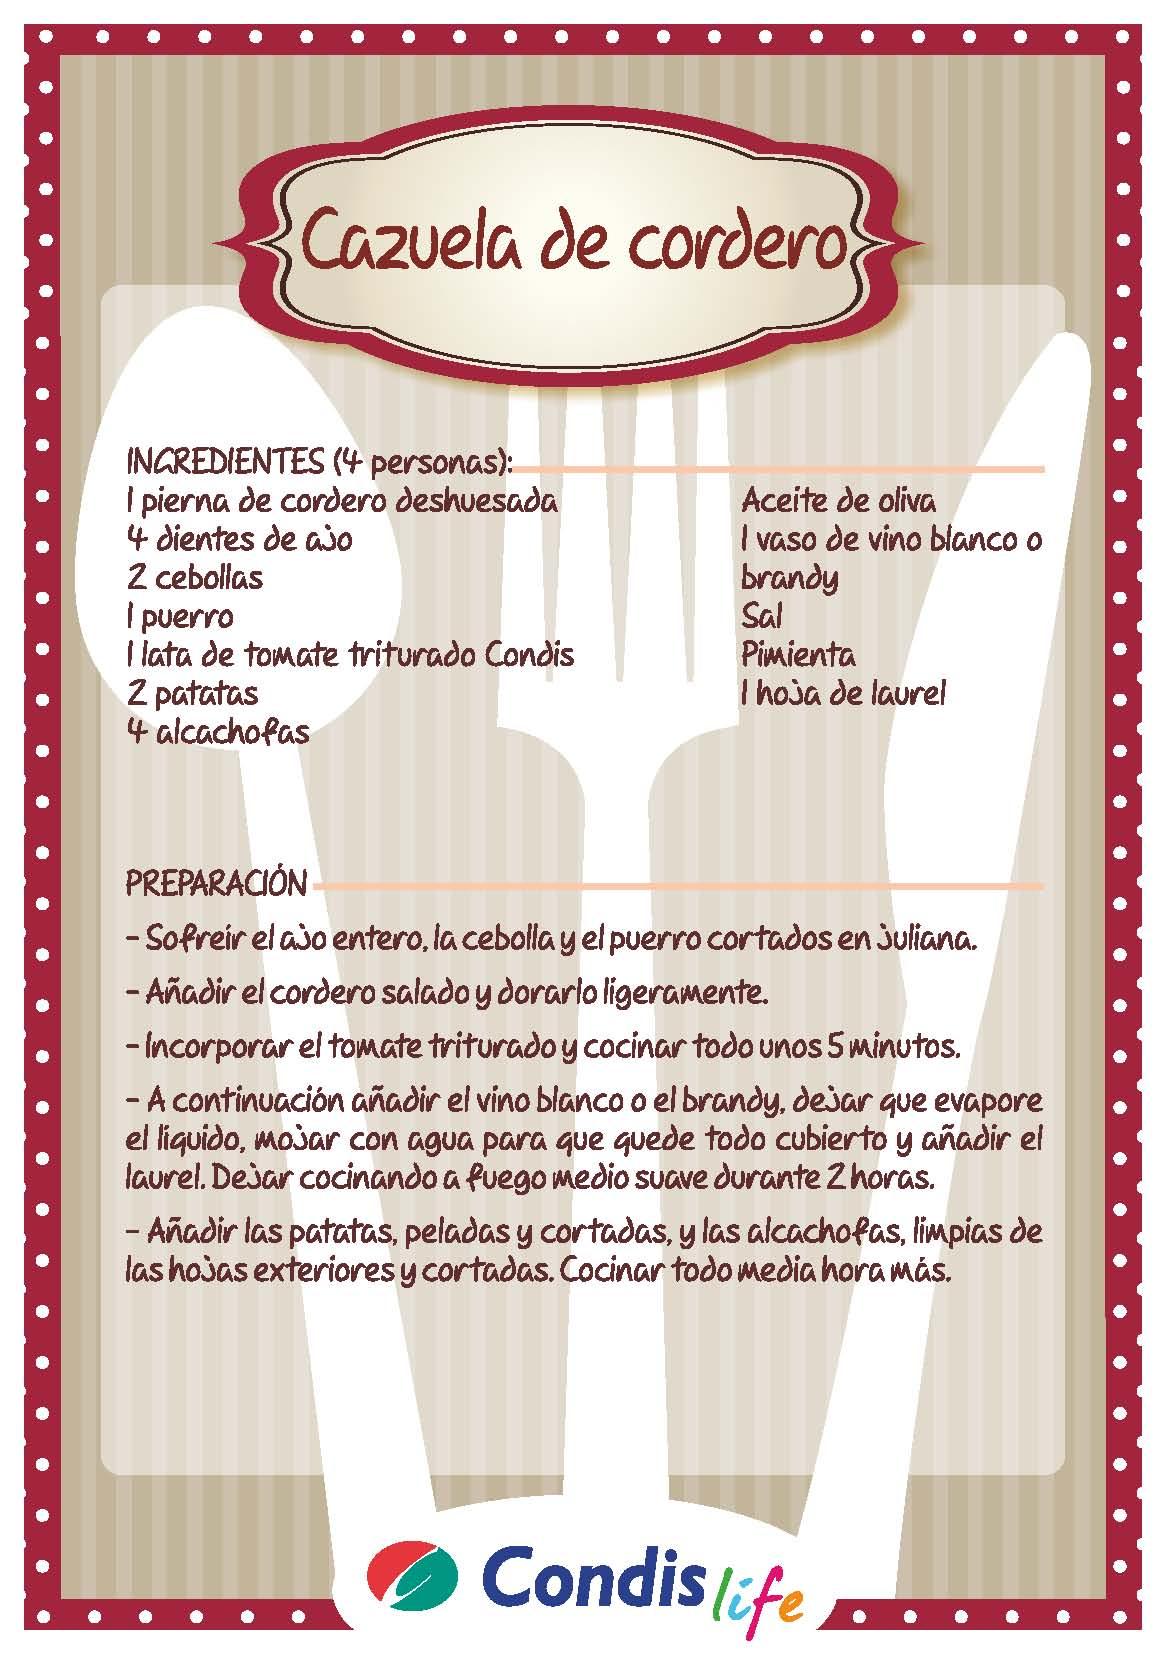 CAZUELA_CORDERO